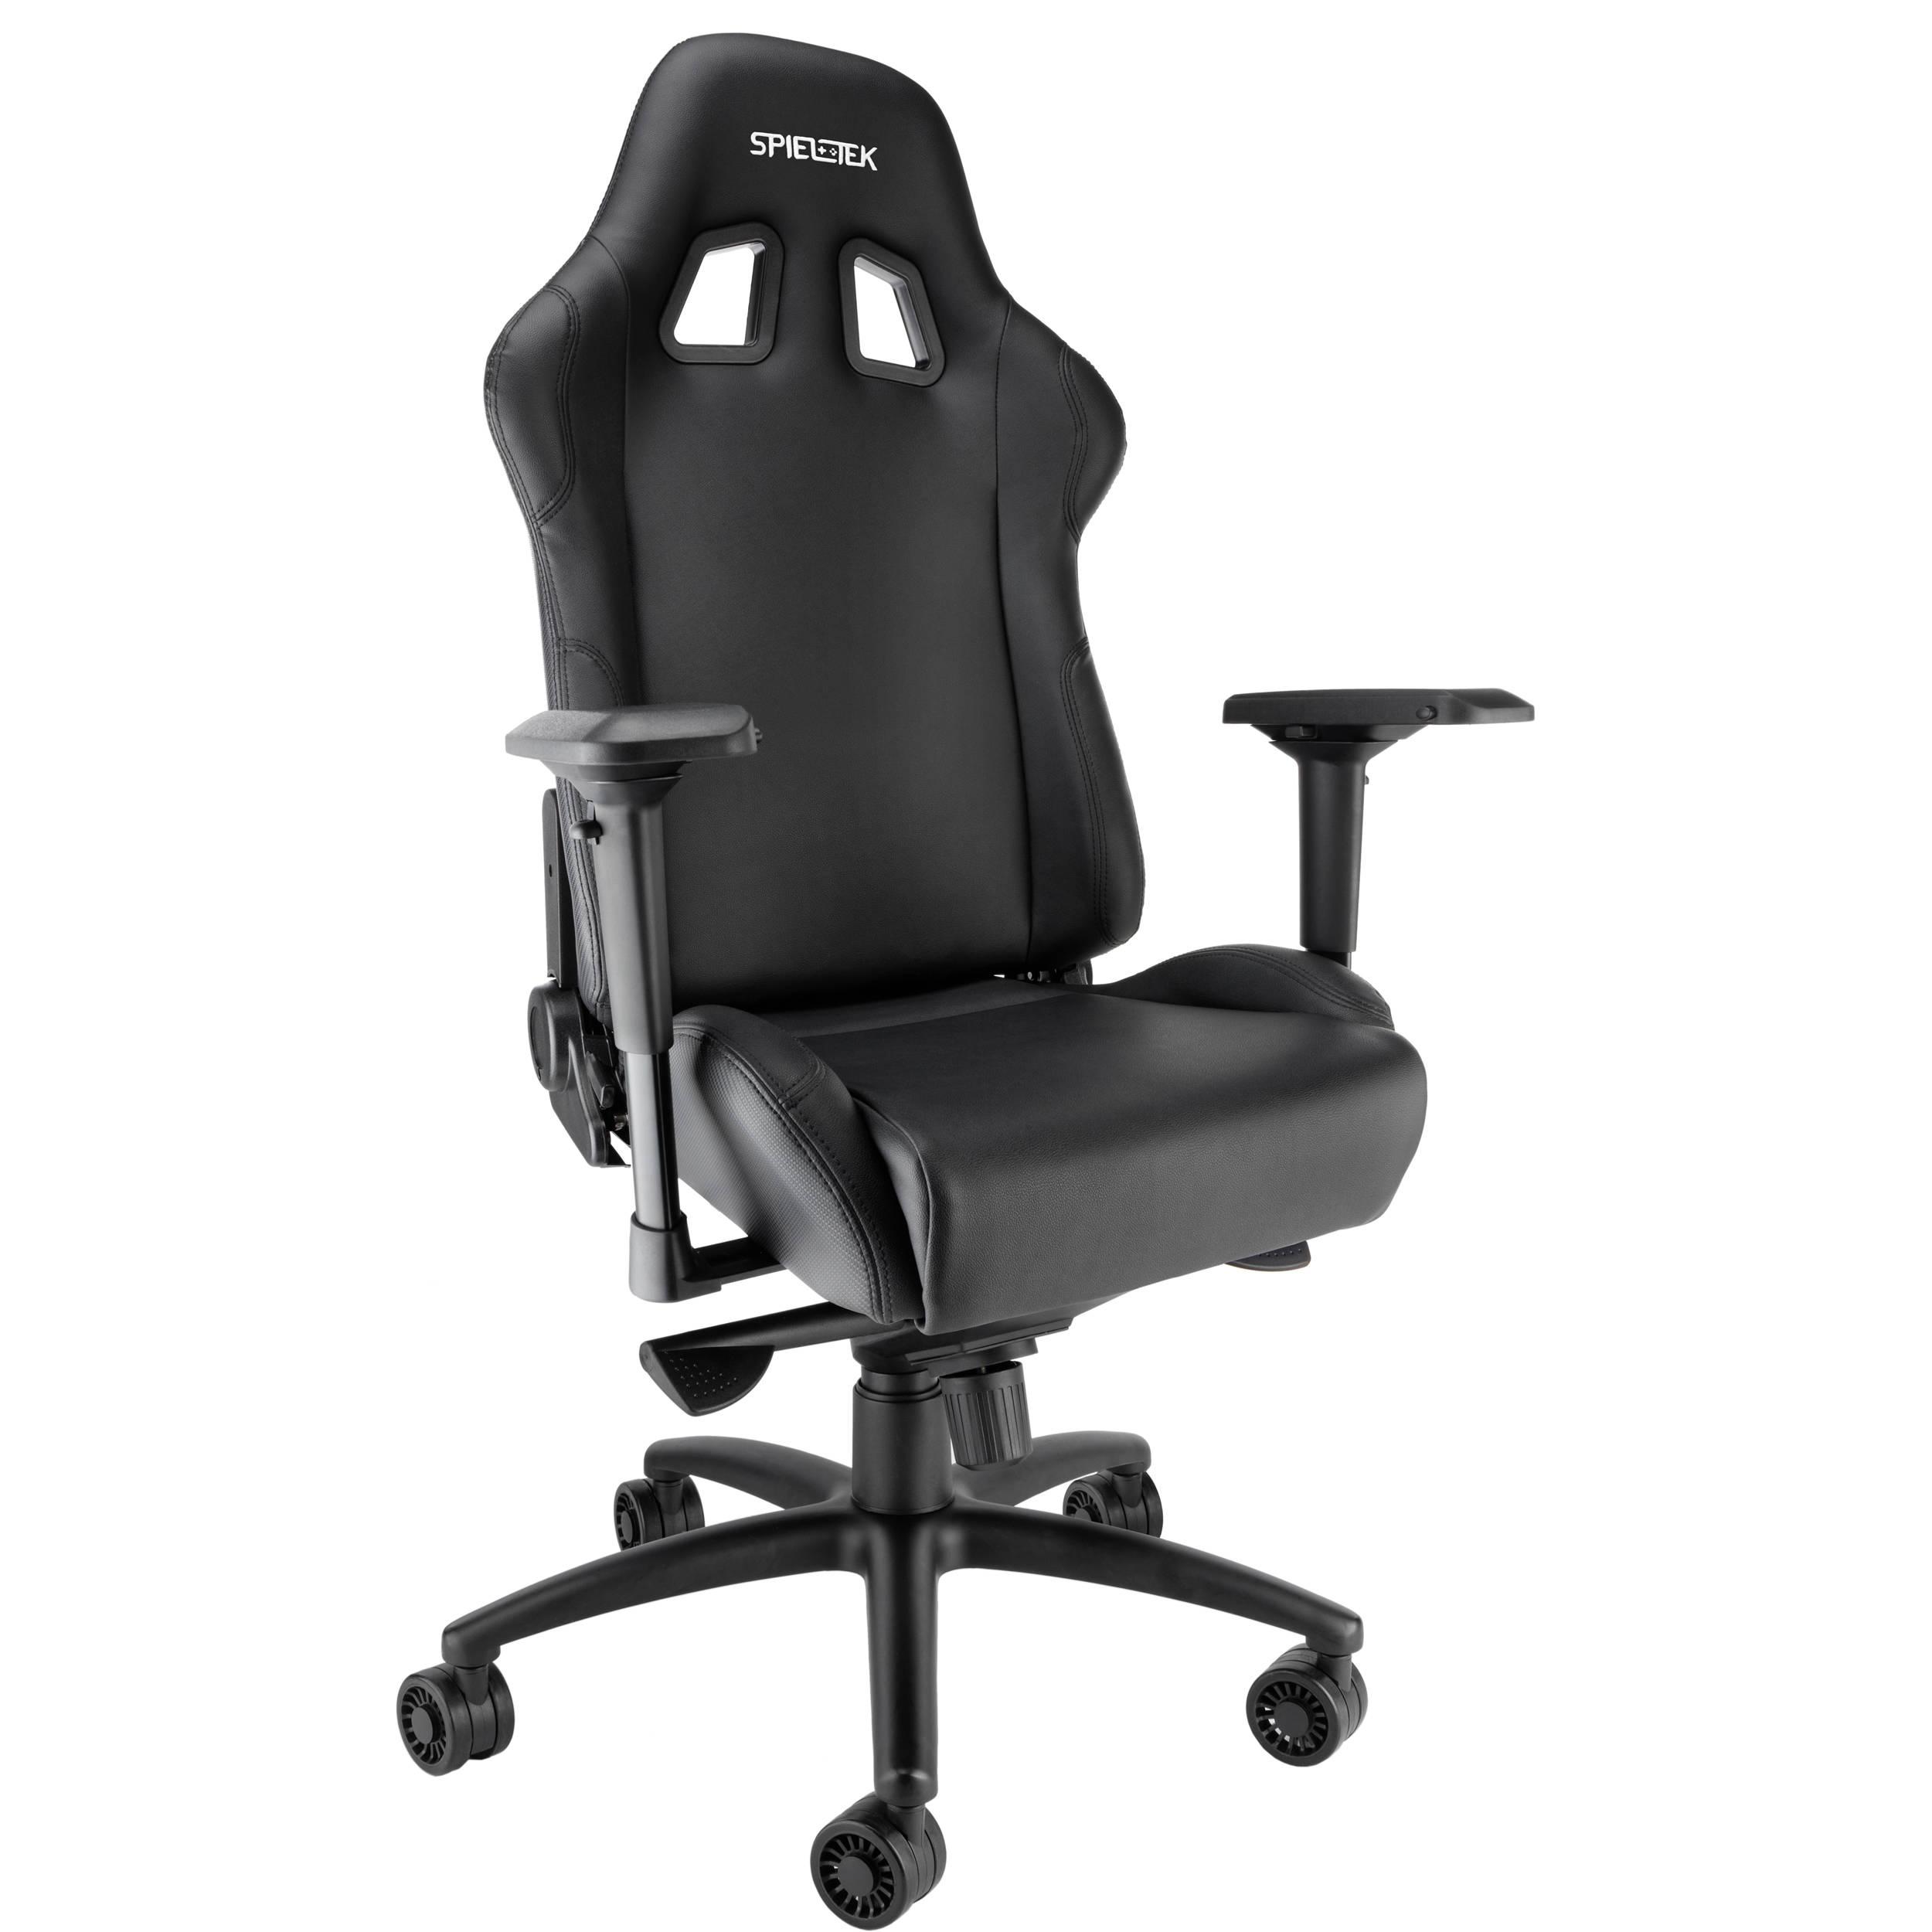 Terrific Spieltek Bandit Xl Gaming Chair Black Frankydiablos Diy Chair Ideas Frankydiabloscom